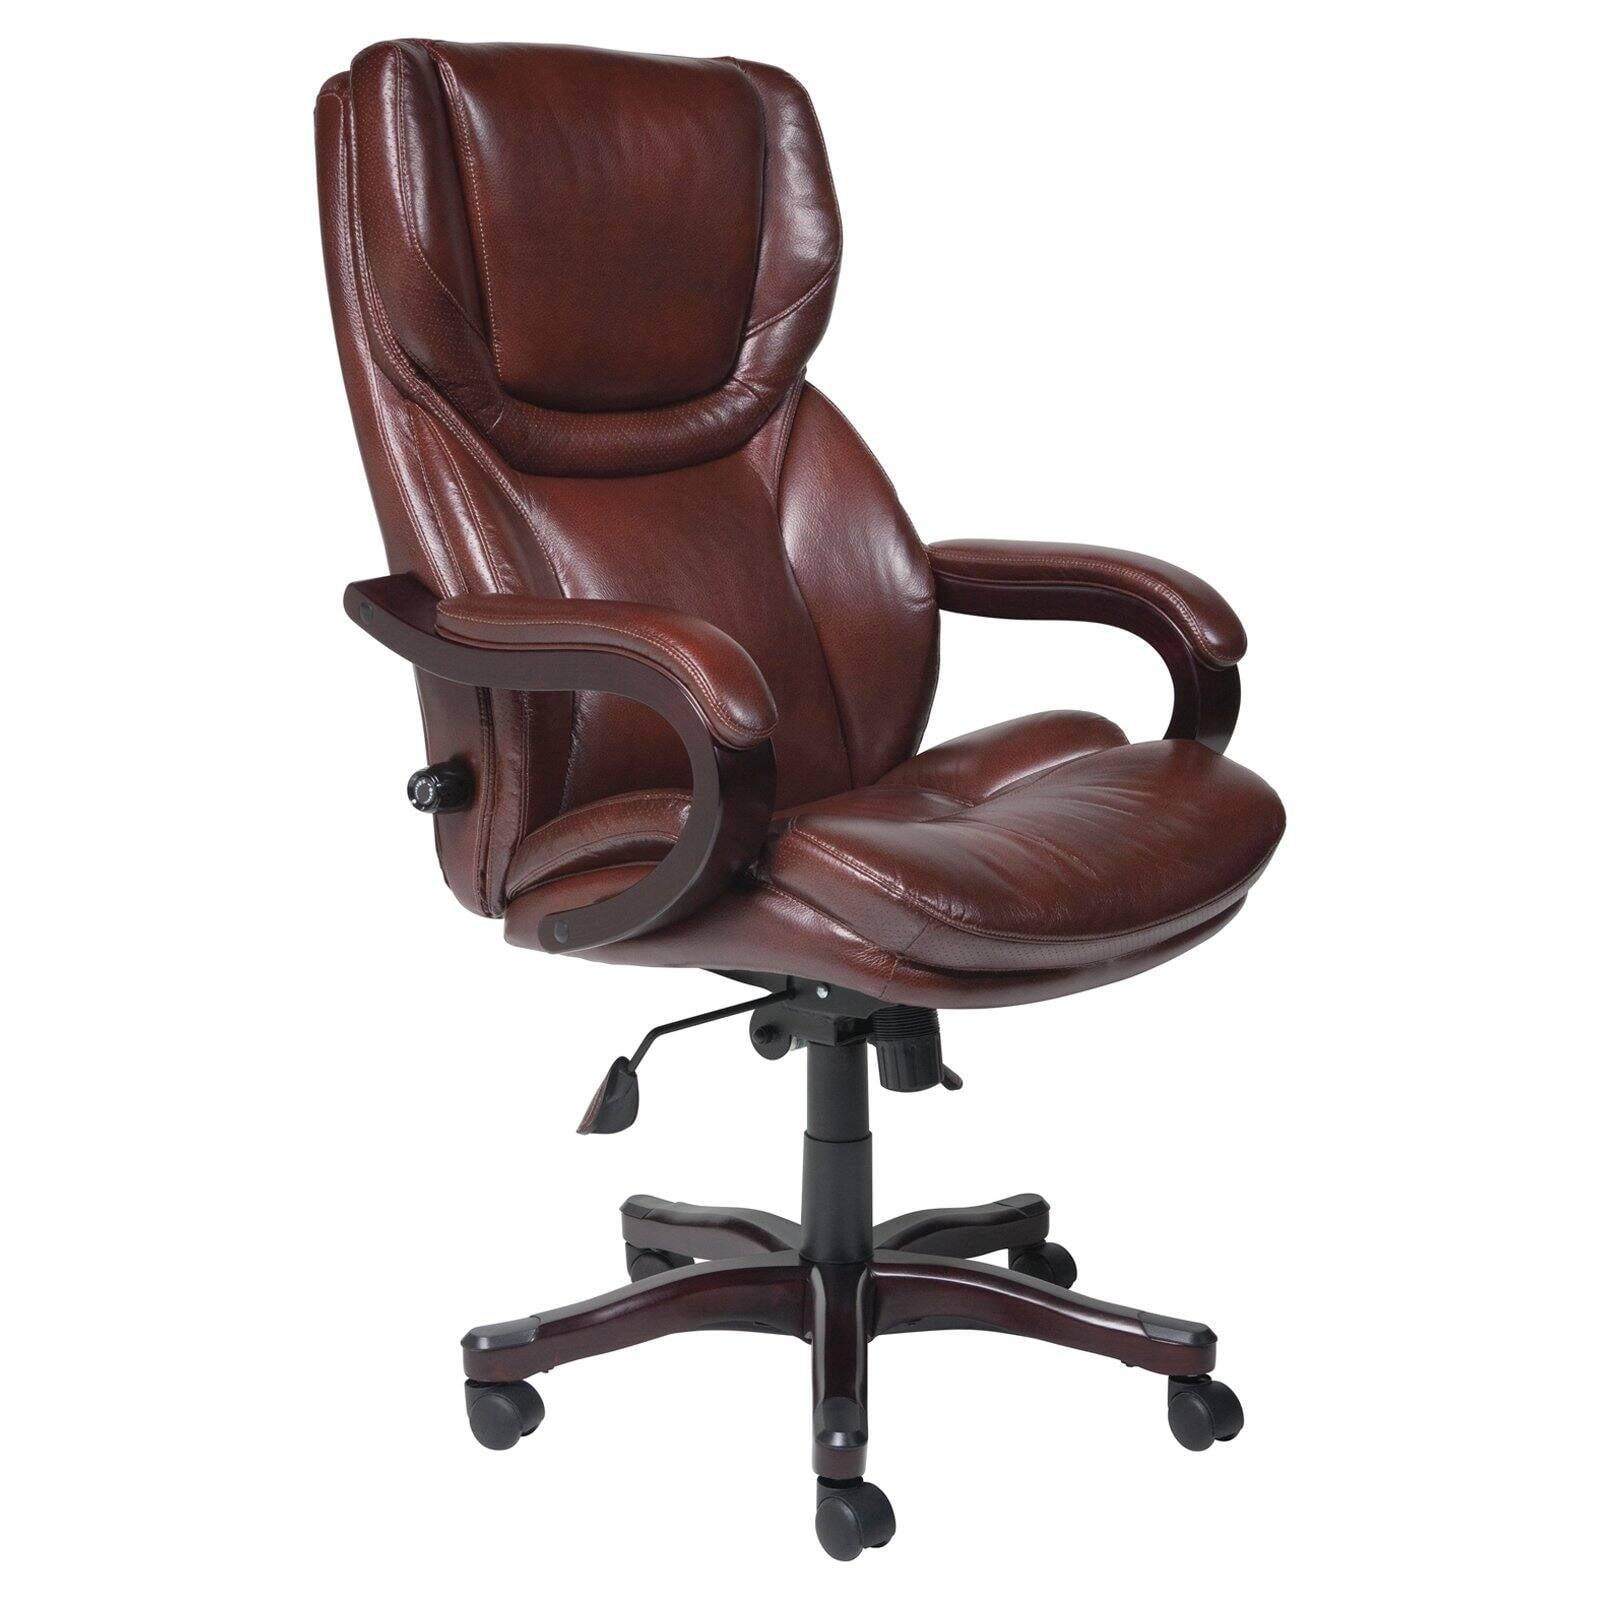 Serta Executive Big Tall Bonded Leather Office Chair Brown Walmart Com Walmart Com